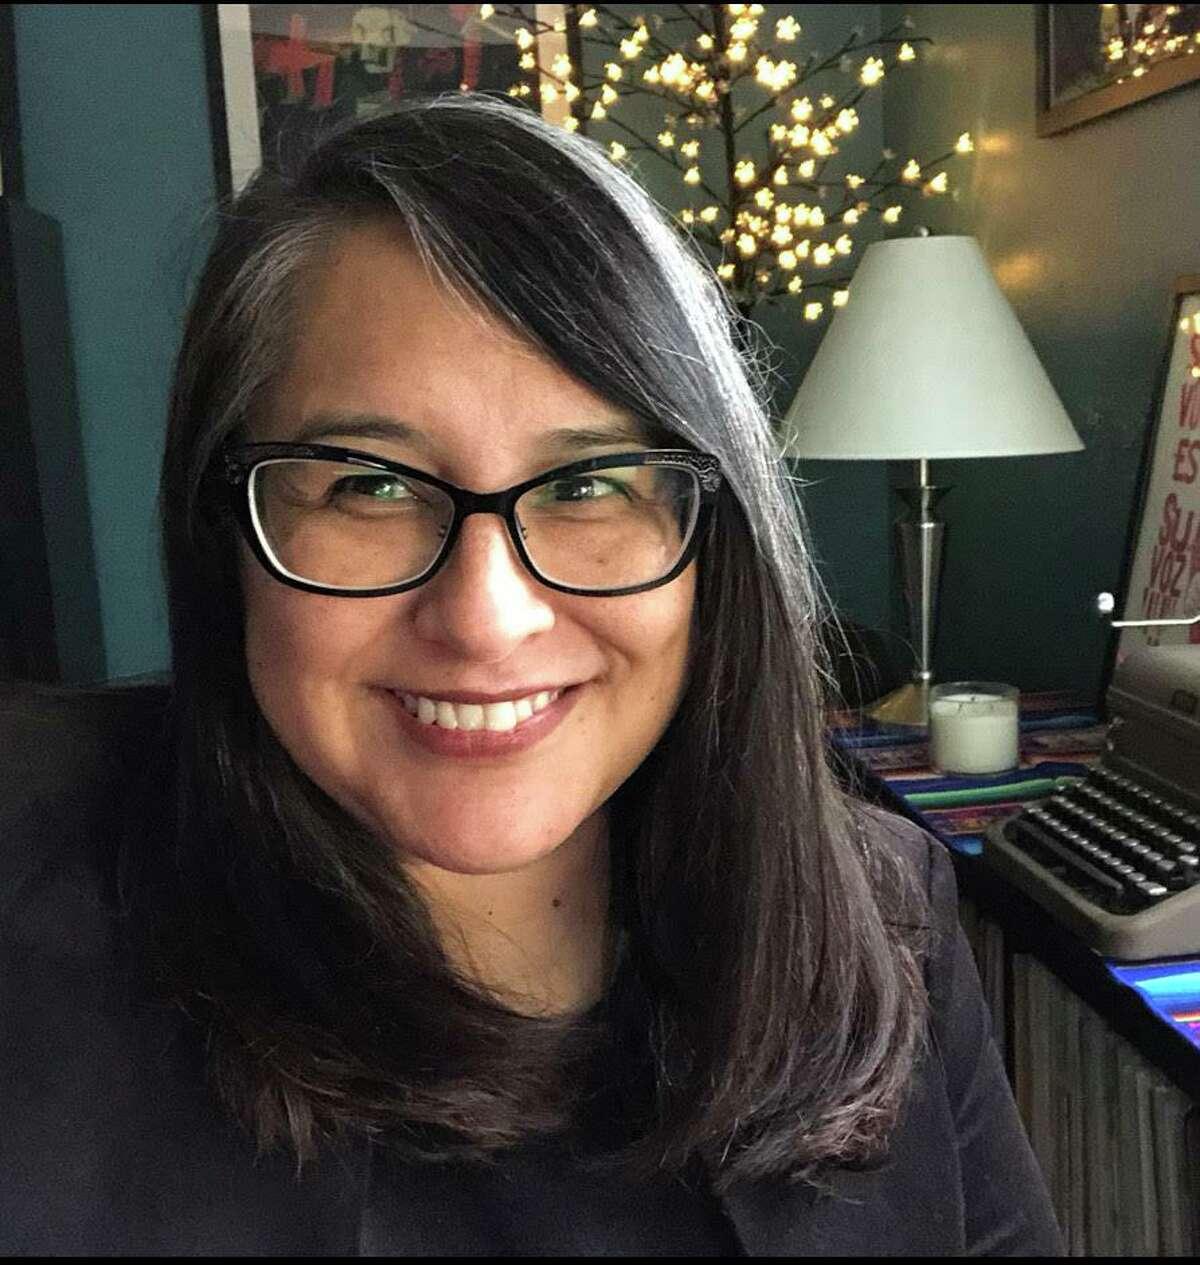 San Antonio organizer Jenn Longoria played a key role in the 2020 campaigns of Joe Biden and Elizabeth Warren.